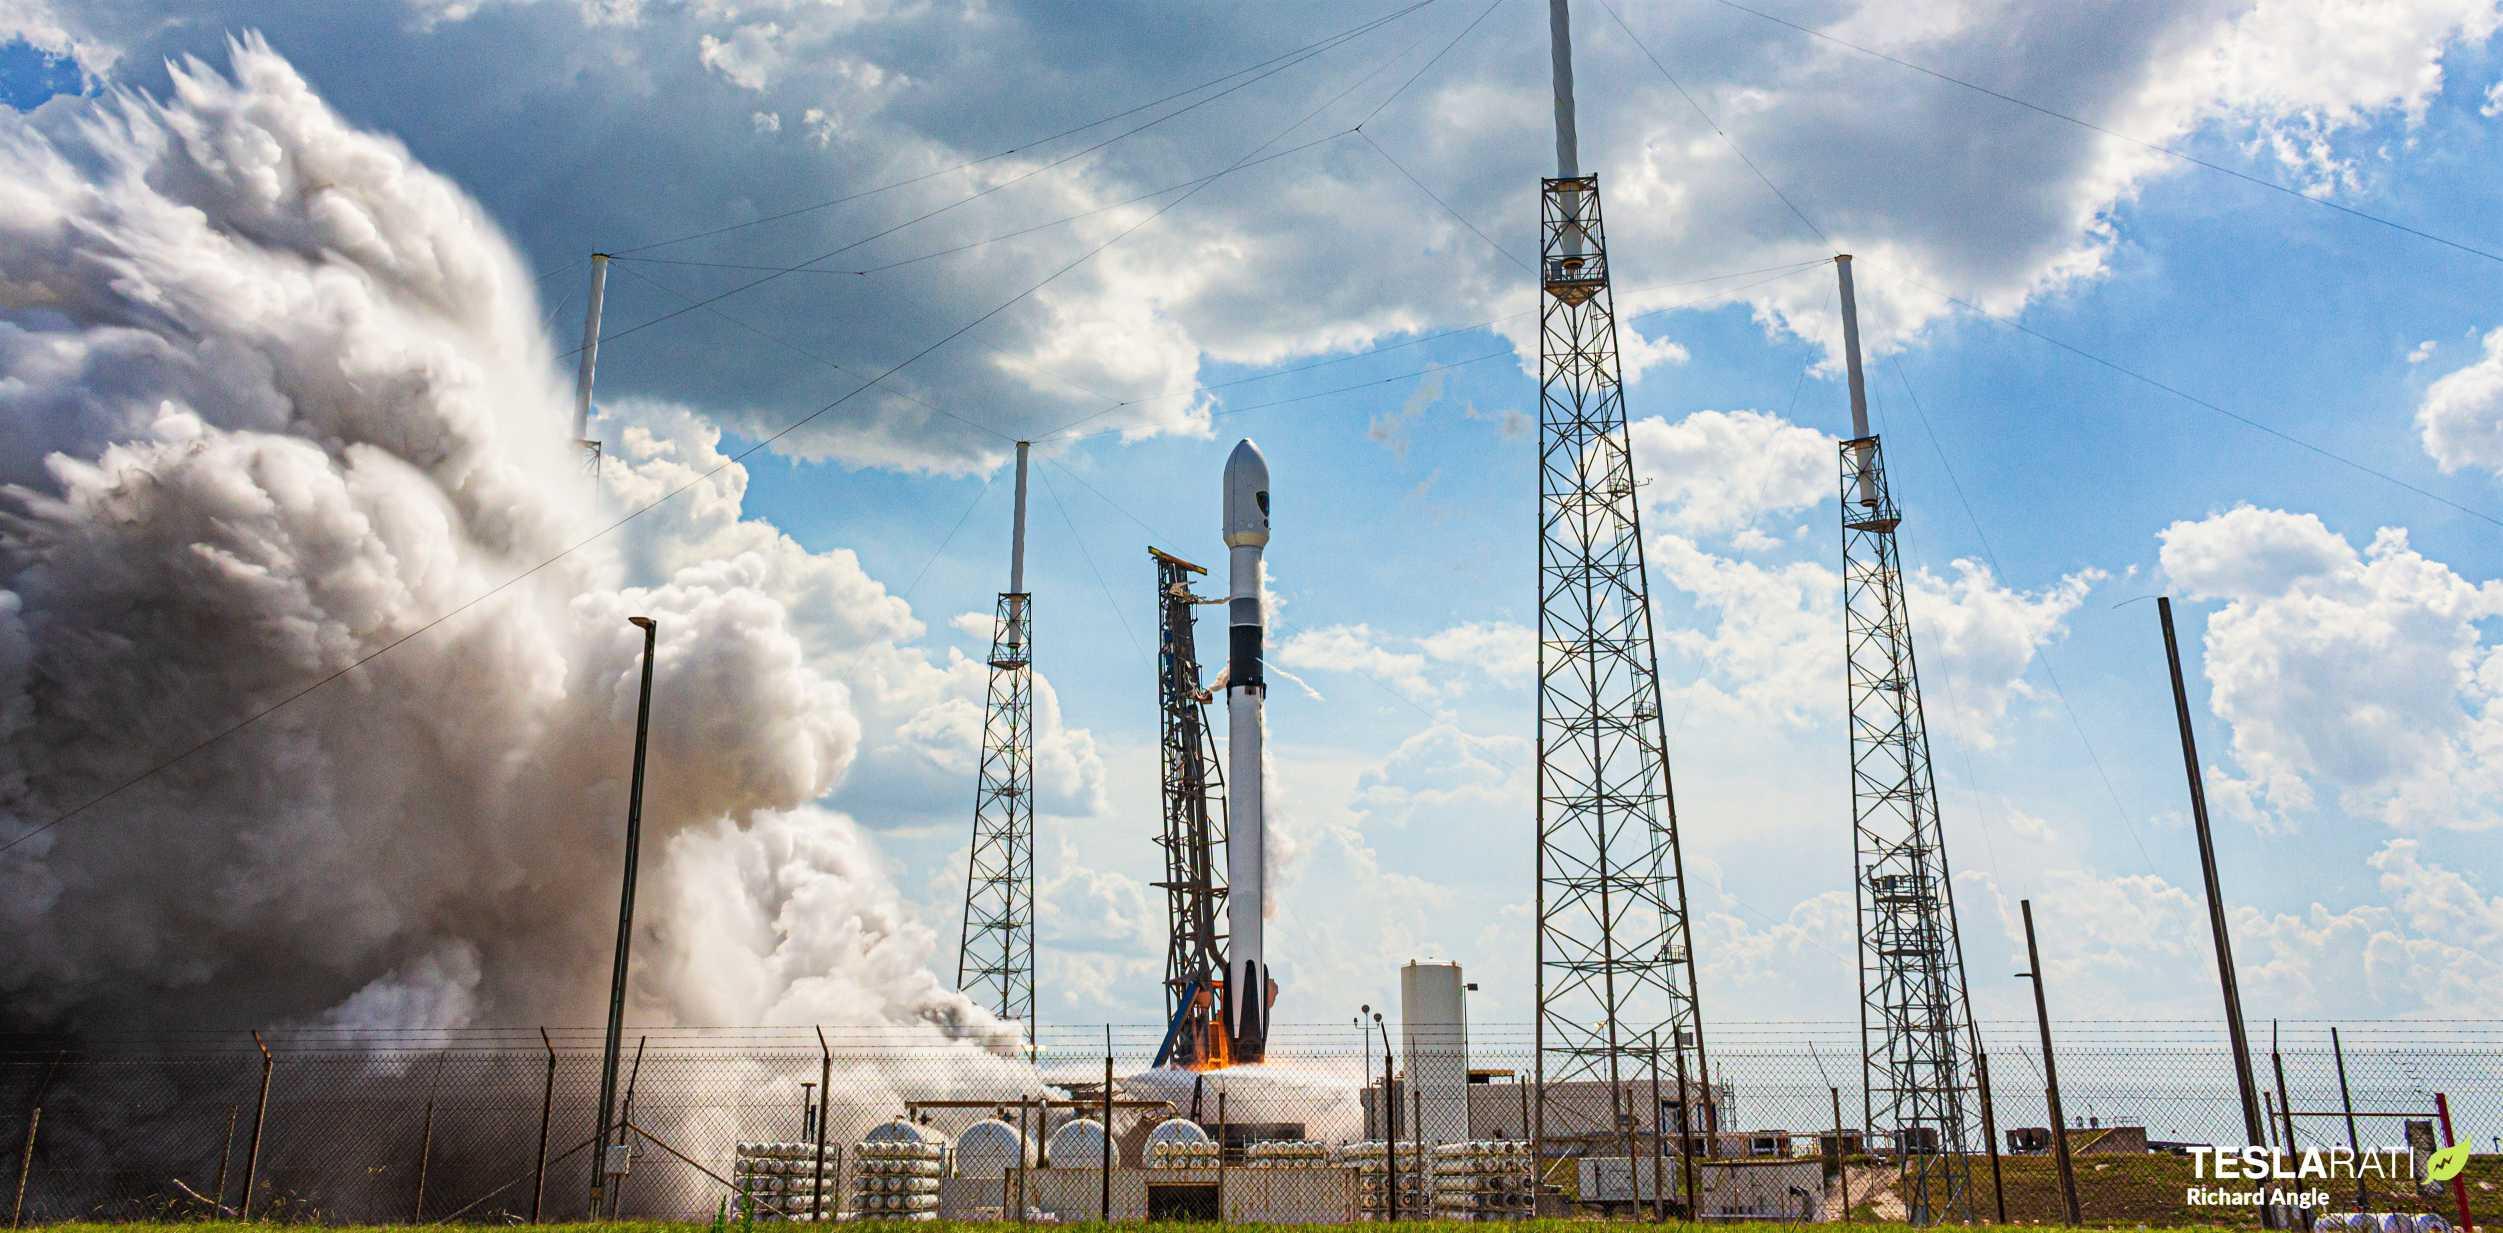 GPS III SV03 Falcon 9 B1060 063020 (Richard Angle) launch 5 crop (c)